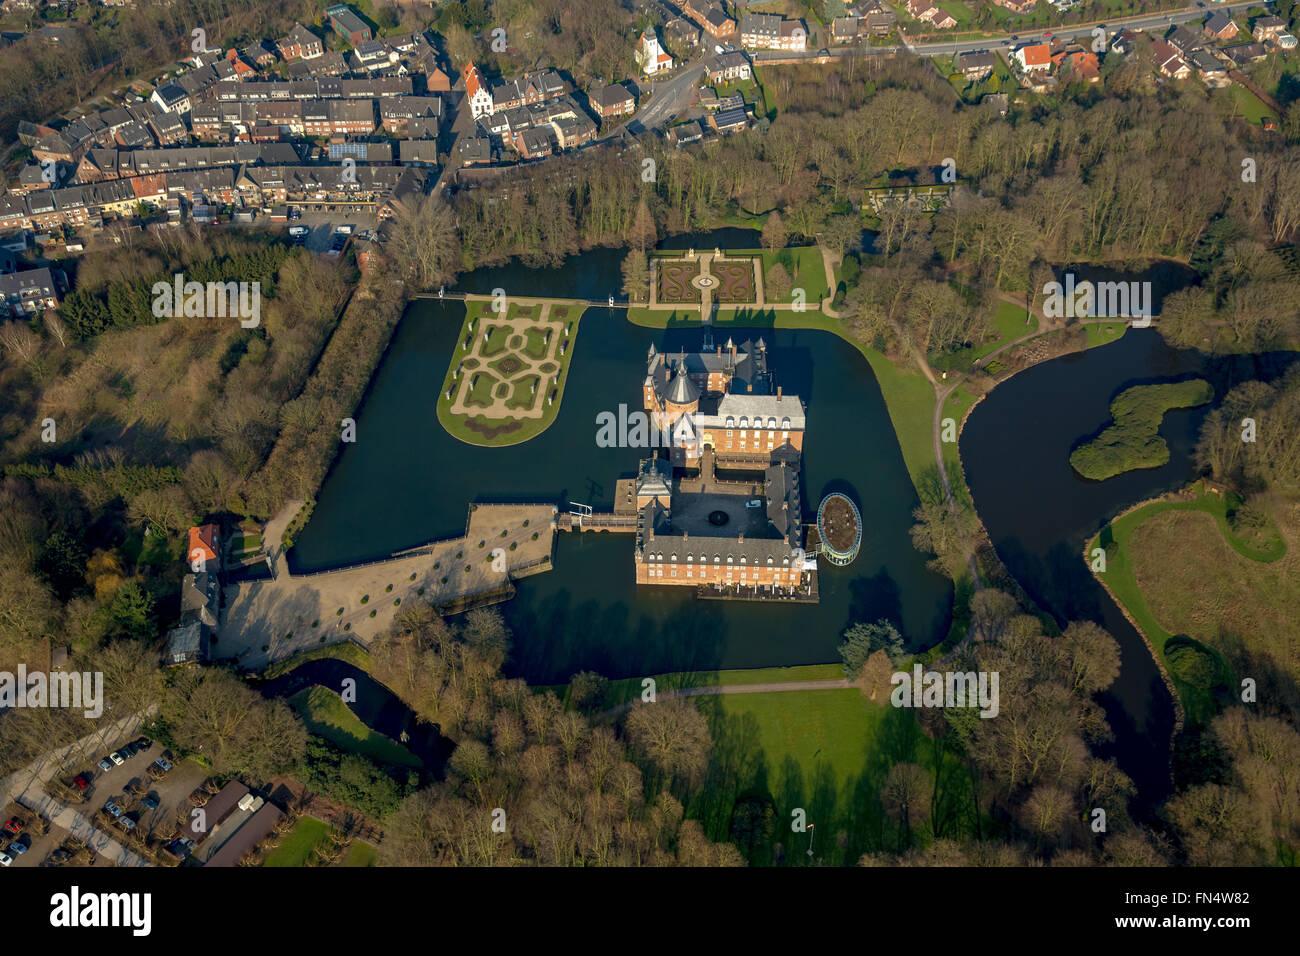 Aerial view, Museum Anholt Castle, Romantik Parkhotel Wasserburg Anholt, castle, Isselburg, Isselburg, Lower Rhine - Stock Image